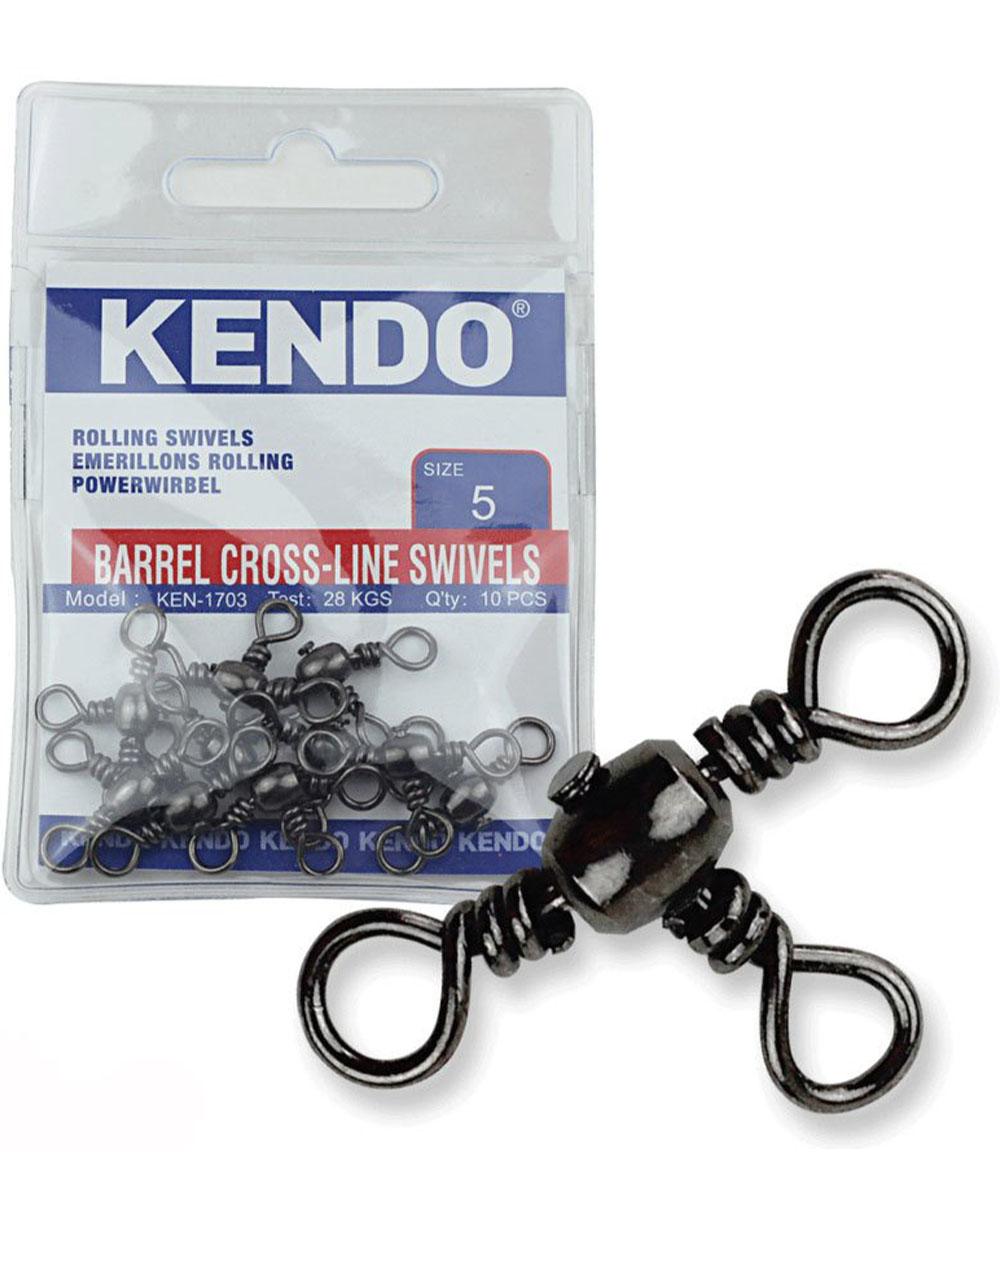 KENDO - Kendo Barrel Cross-Line Swivels 10 Adet